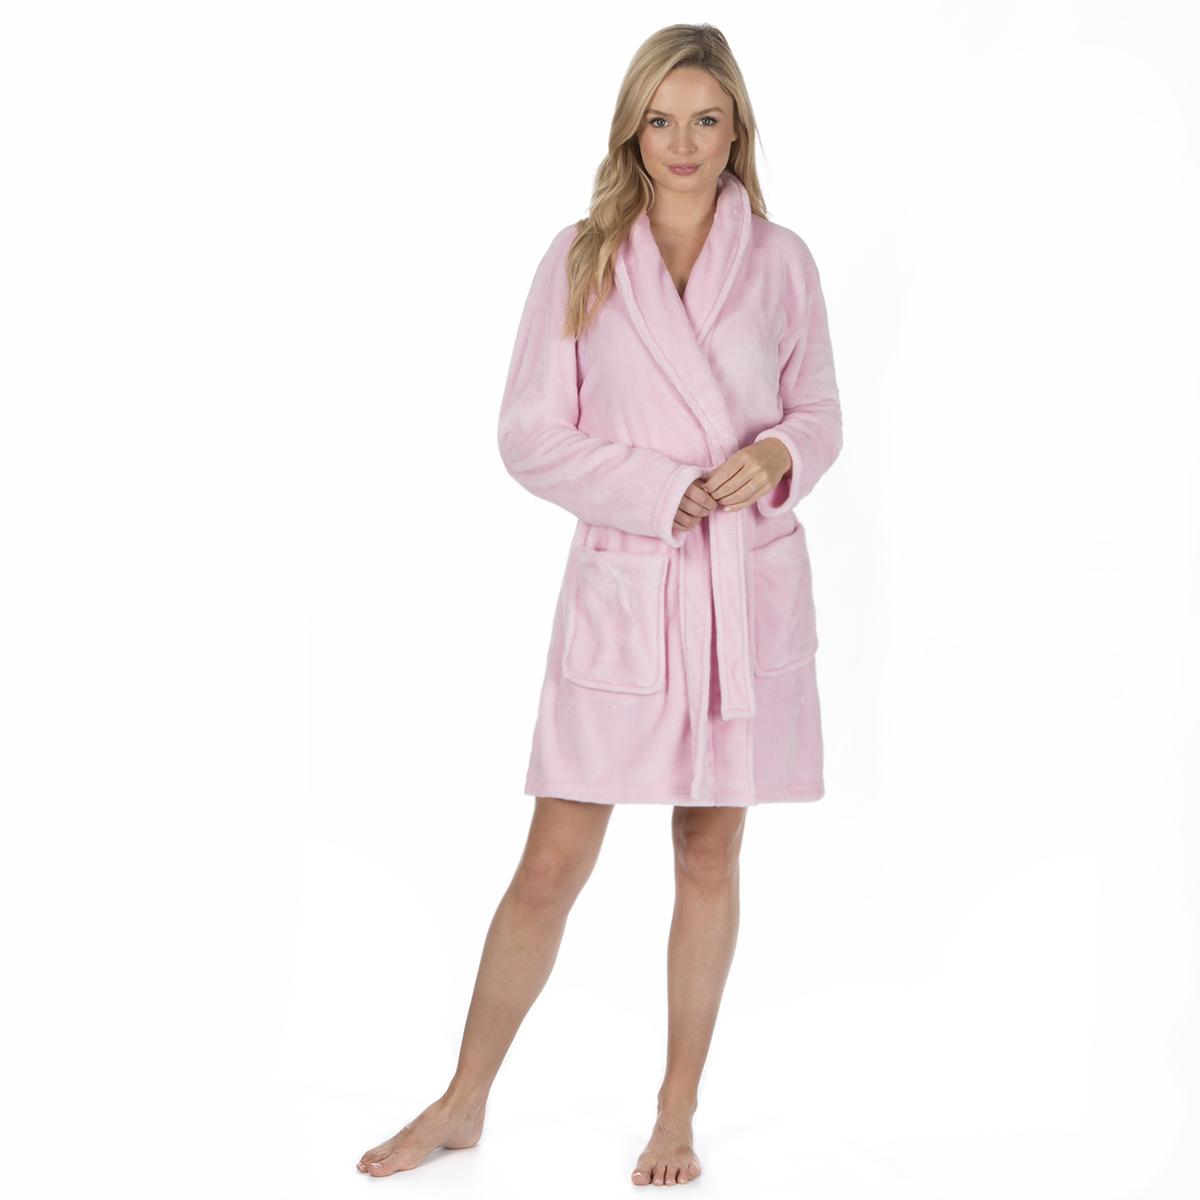 LADIES LUXURY SOFT COSY WARM VELOUR SHORT DRESSING GOWN BATH ROBE ...